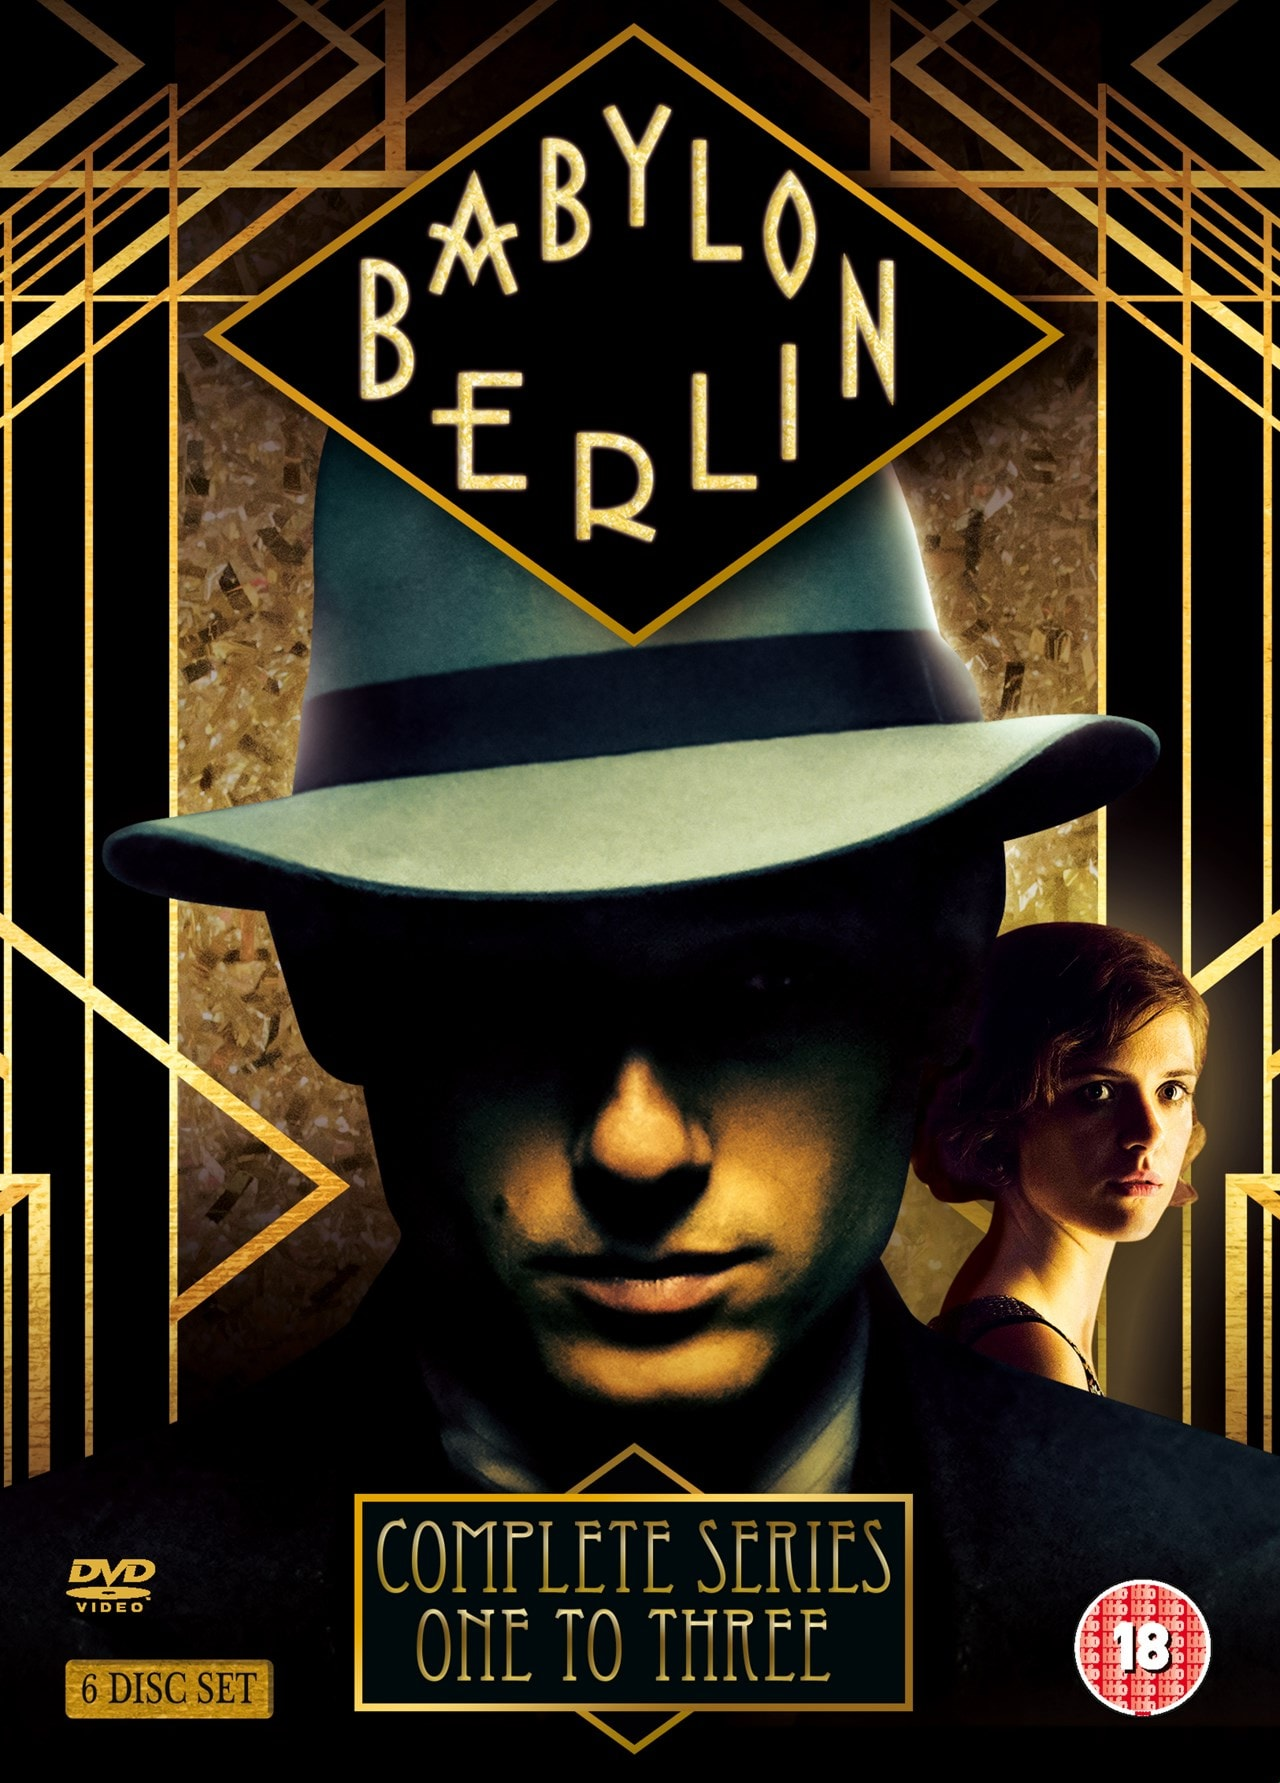 Babylon Berlin: Series One to Three - 1